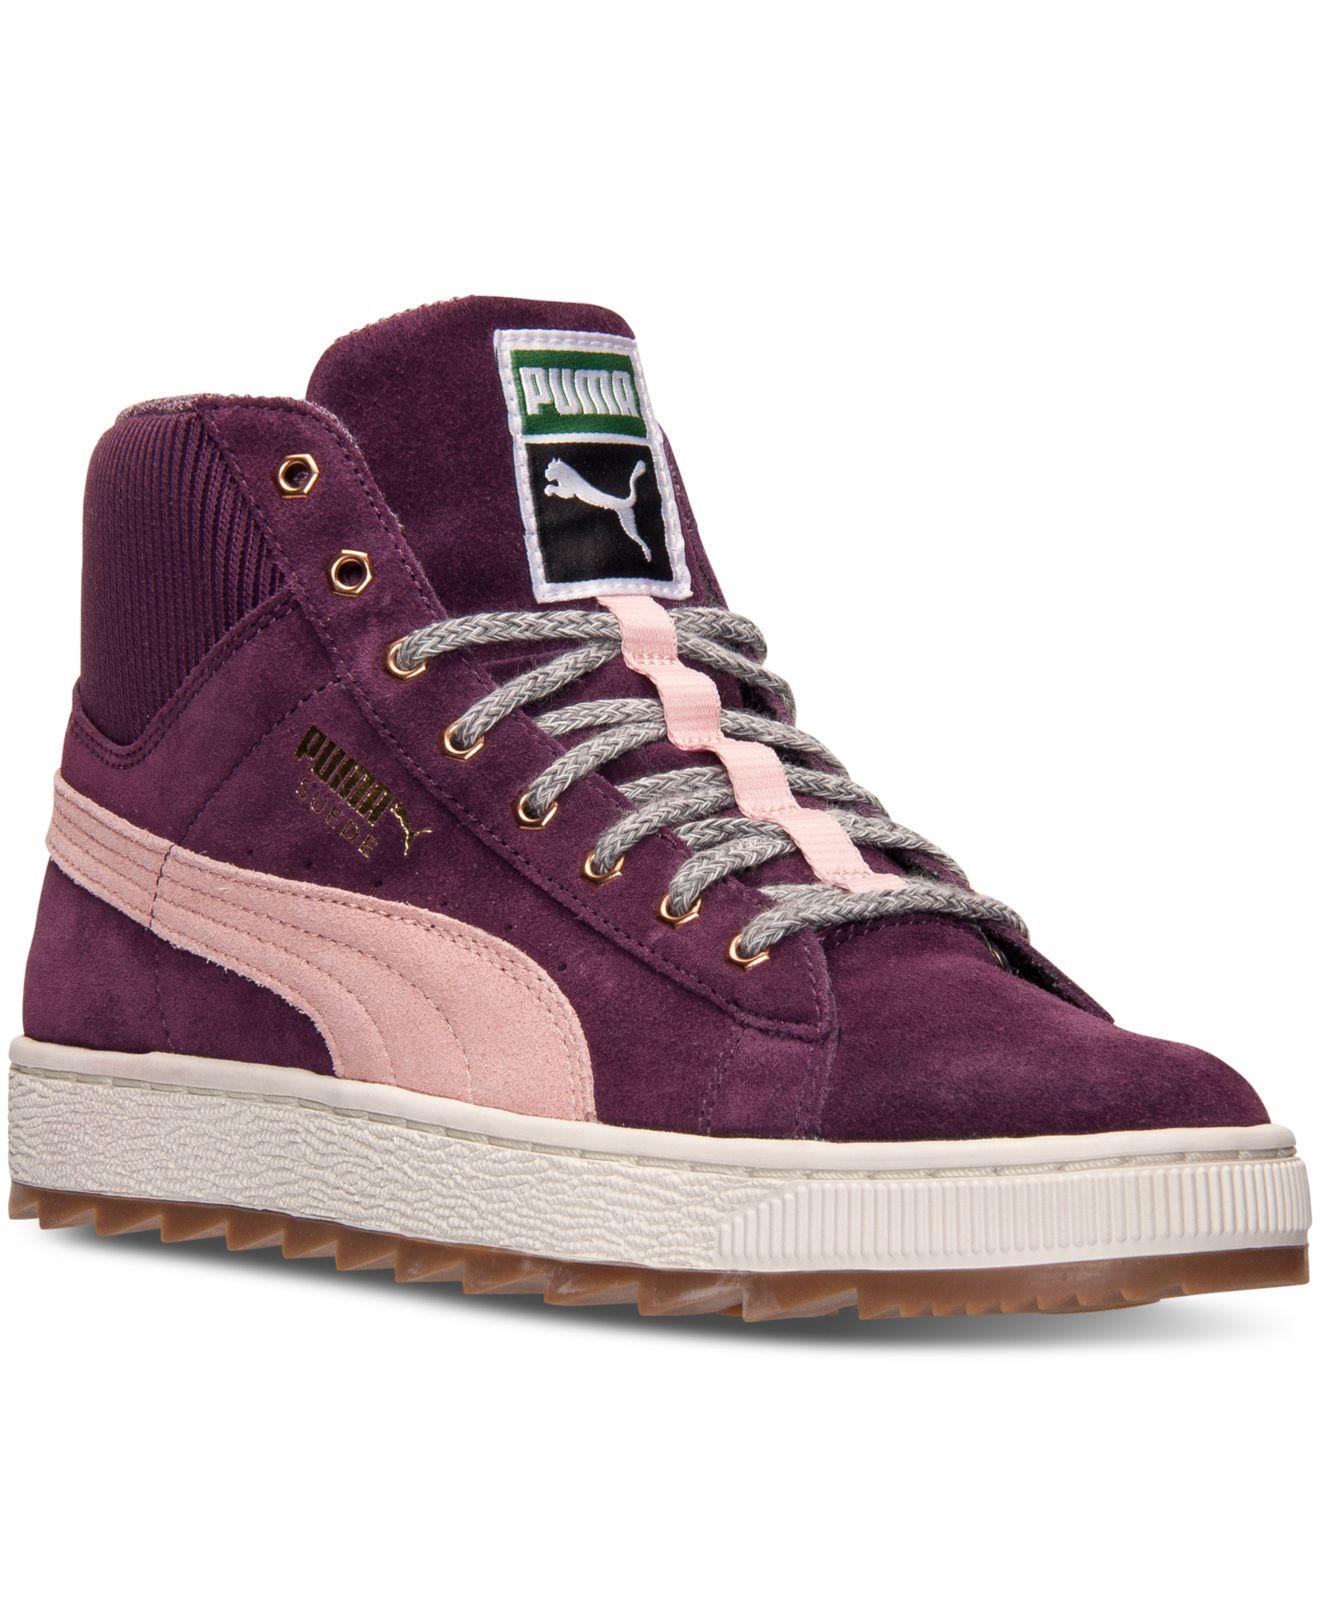 Lyst - PUMA Women s Suede Winterized Rugged Casual Sneakers From ... ec09df28c